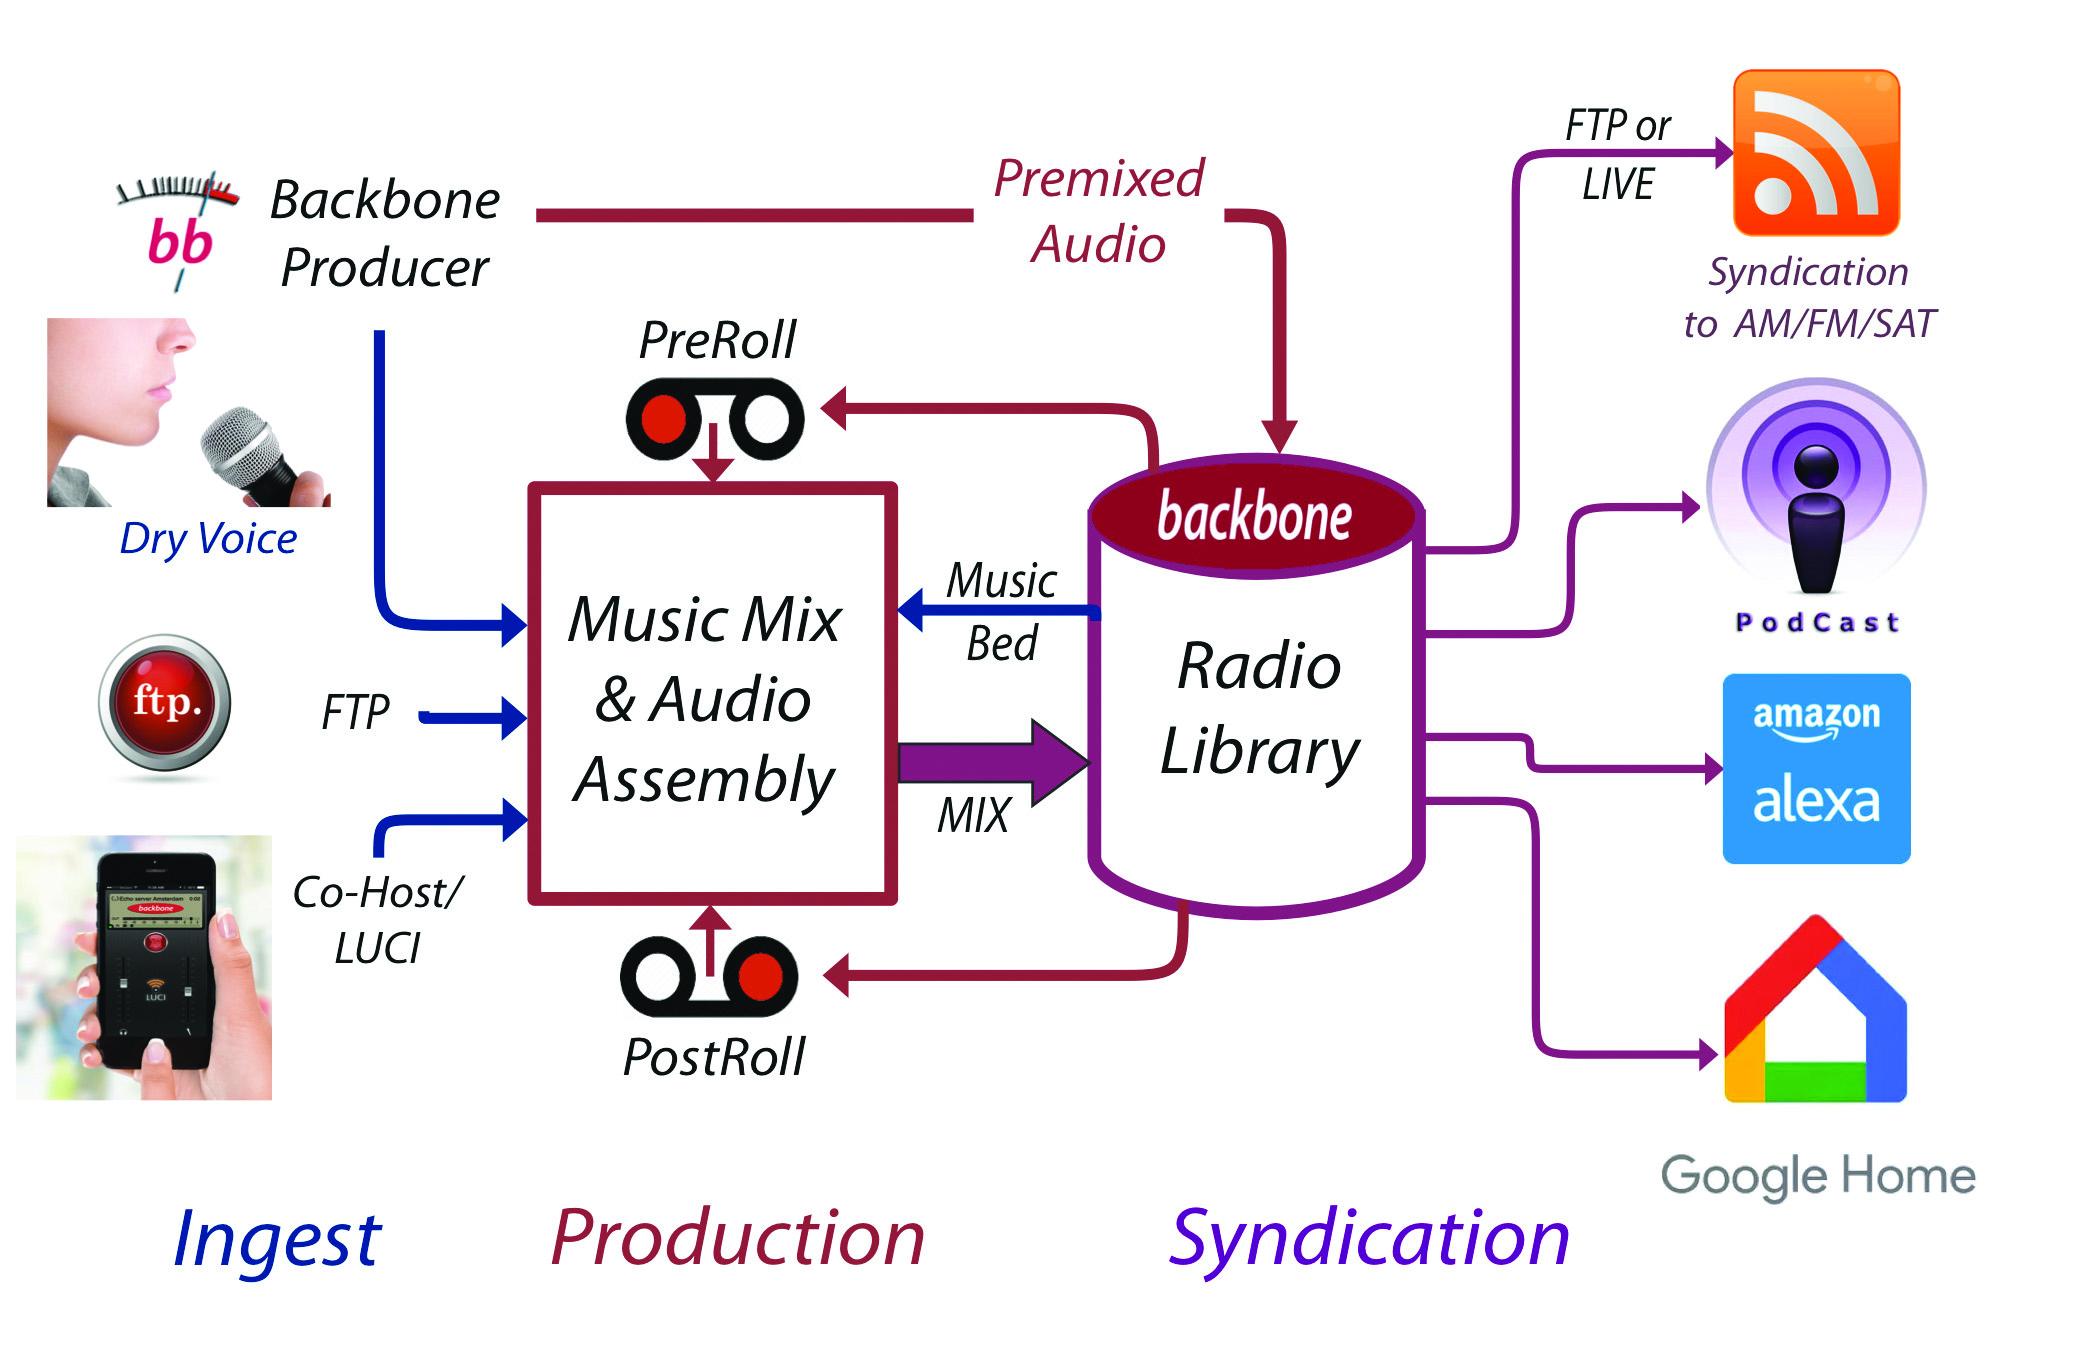 New Backbone Hub Speeds On-Demand Audio Production & Distribution ...